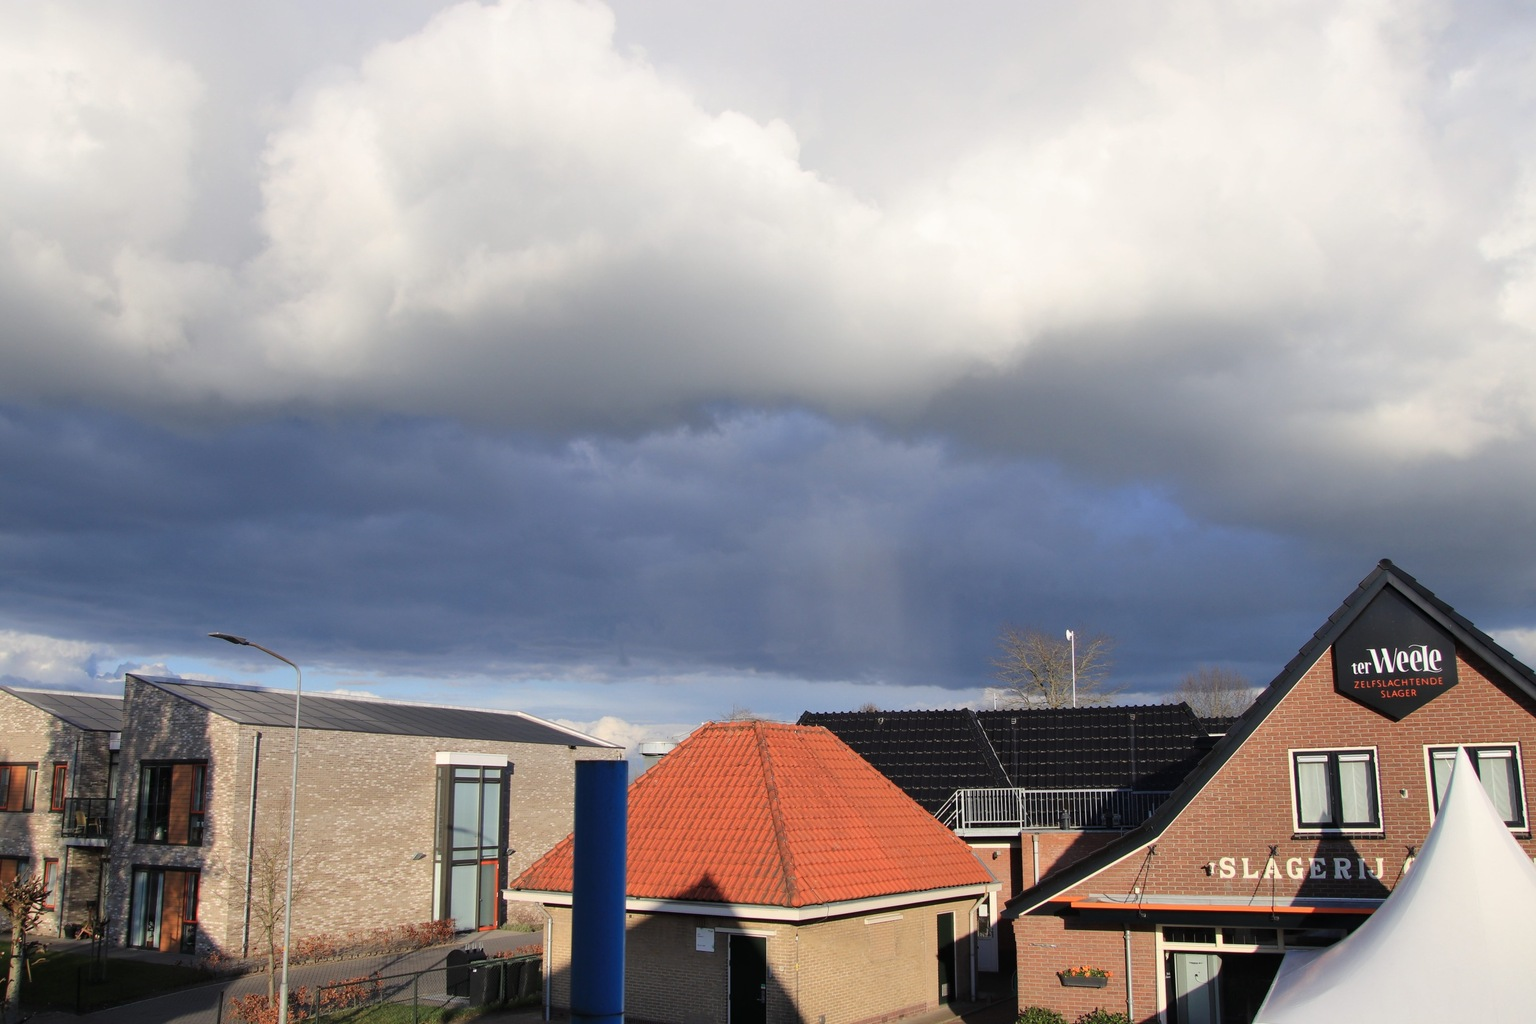 Donkere luchten - Donkere partijen lucht boven Oene - foto door ceos1000dthijs op 11-04-2021 - locatie: 8167 Oene, Nederland - deze foto bevat: wolk, lucht, gebouw, venster, huis, hout, cumulus, woongebied, landschap, stad